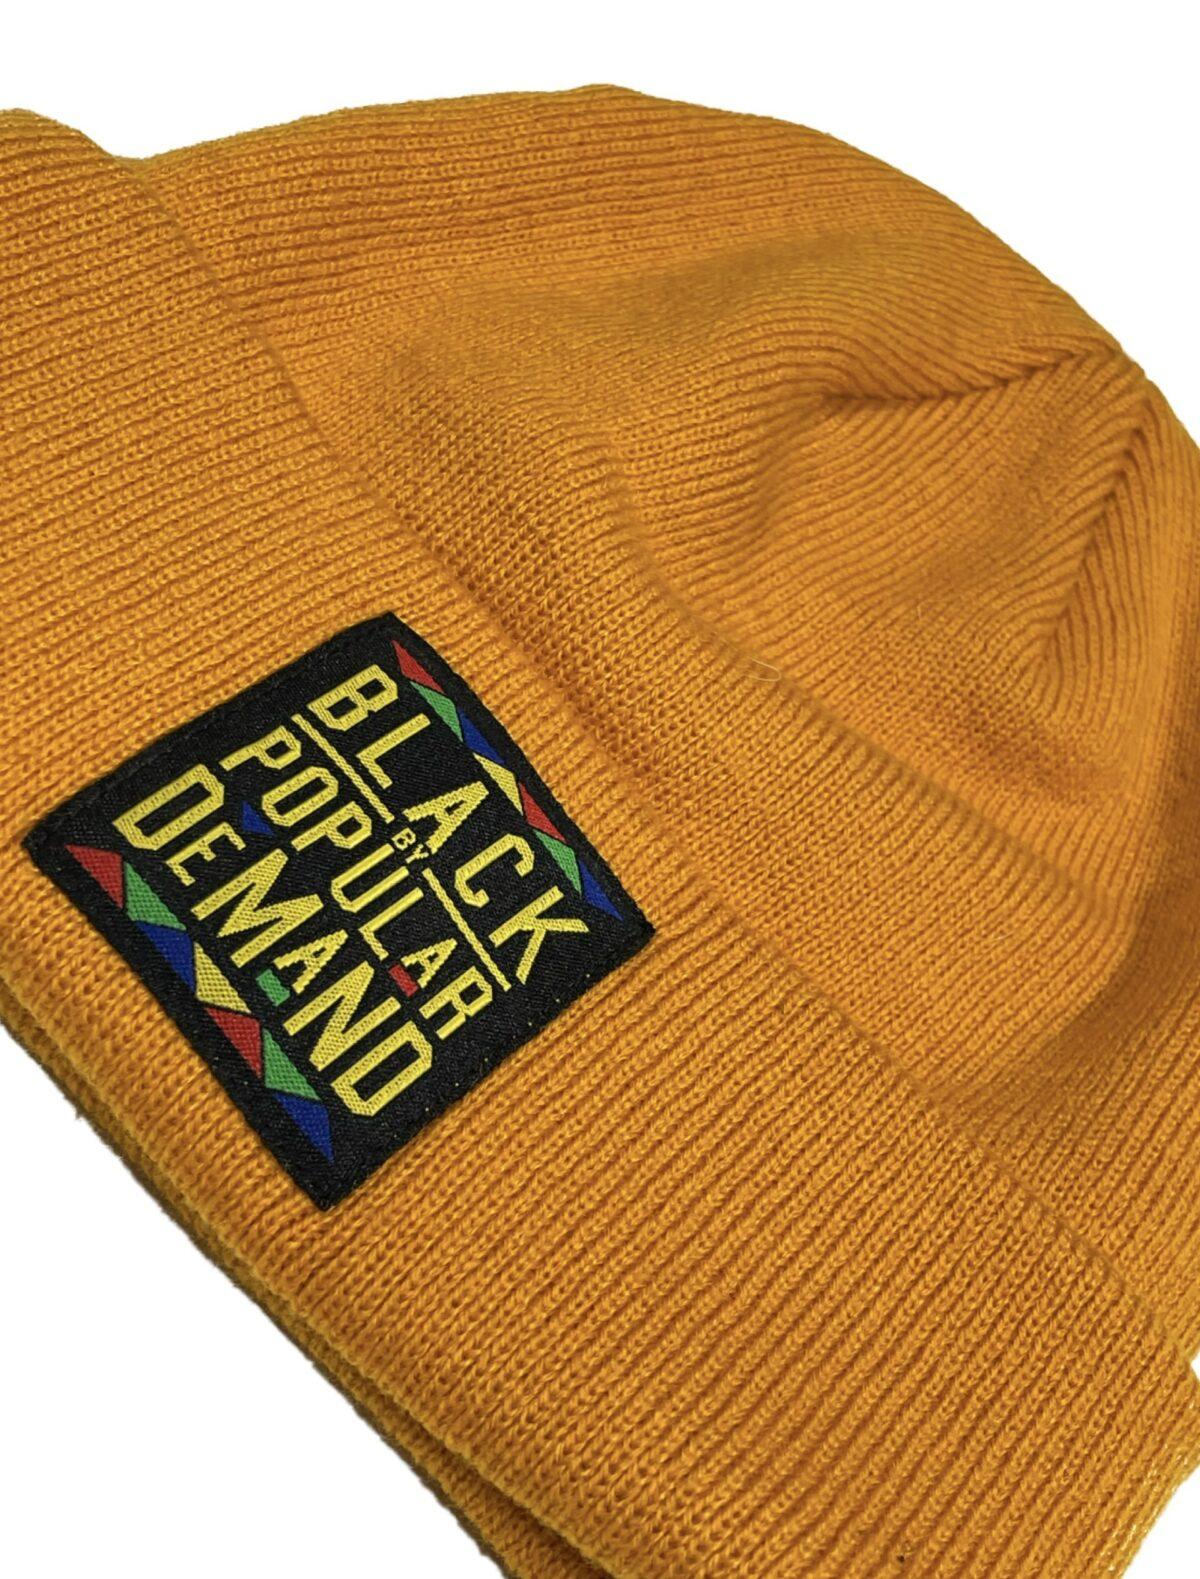 Black by Popular Demand® Yellow Unisex Beanie Hat HGC Apparel